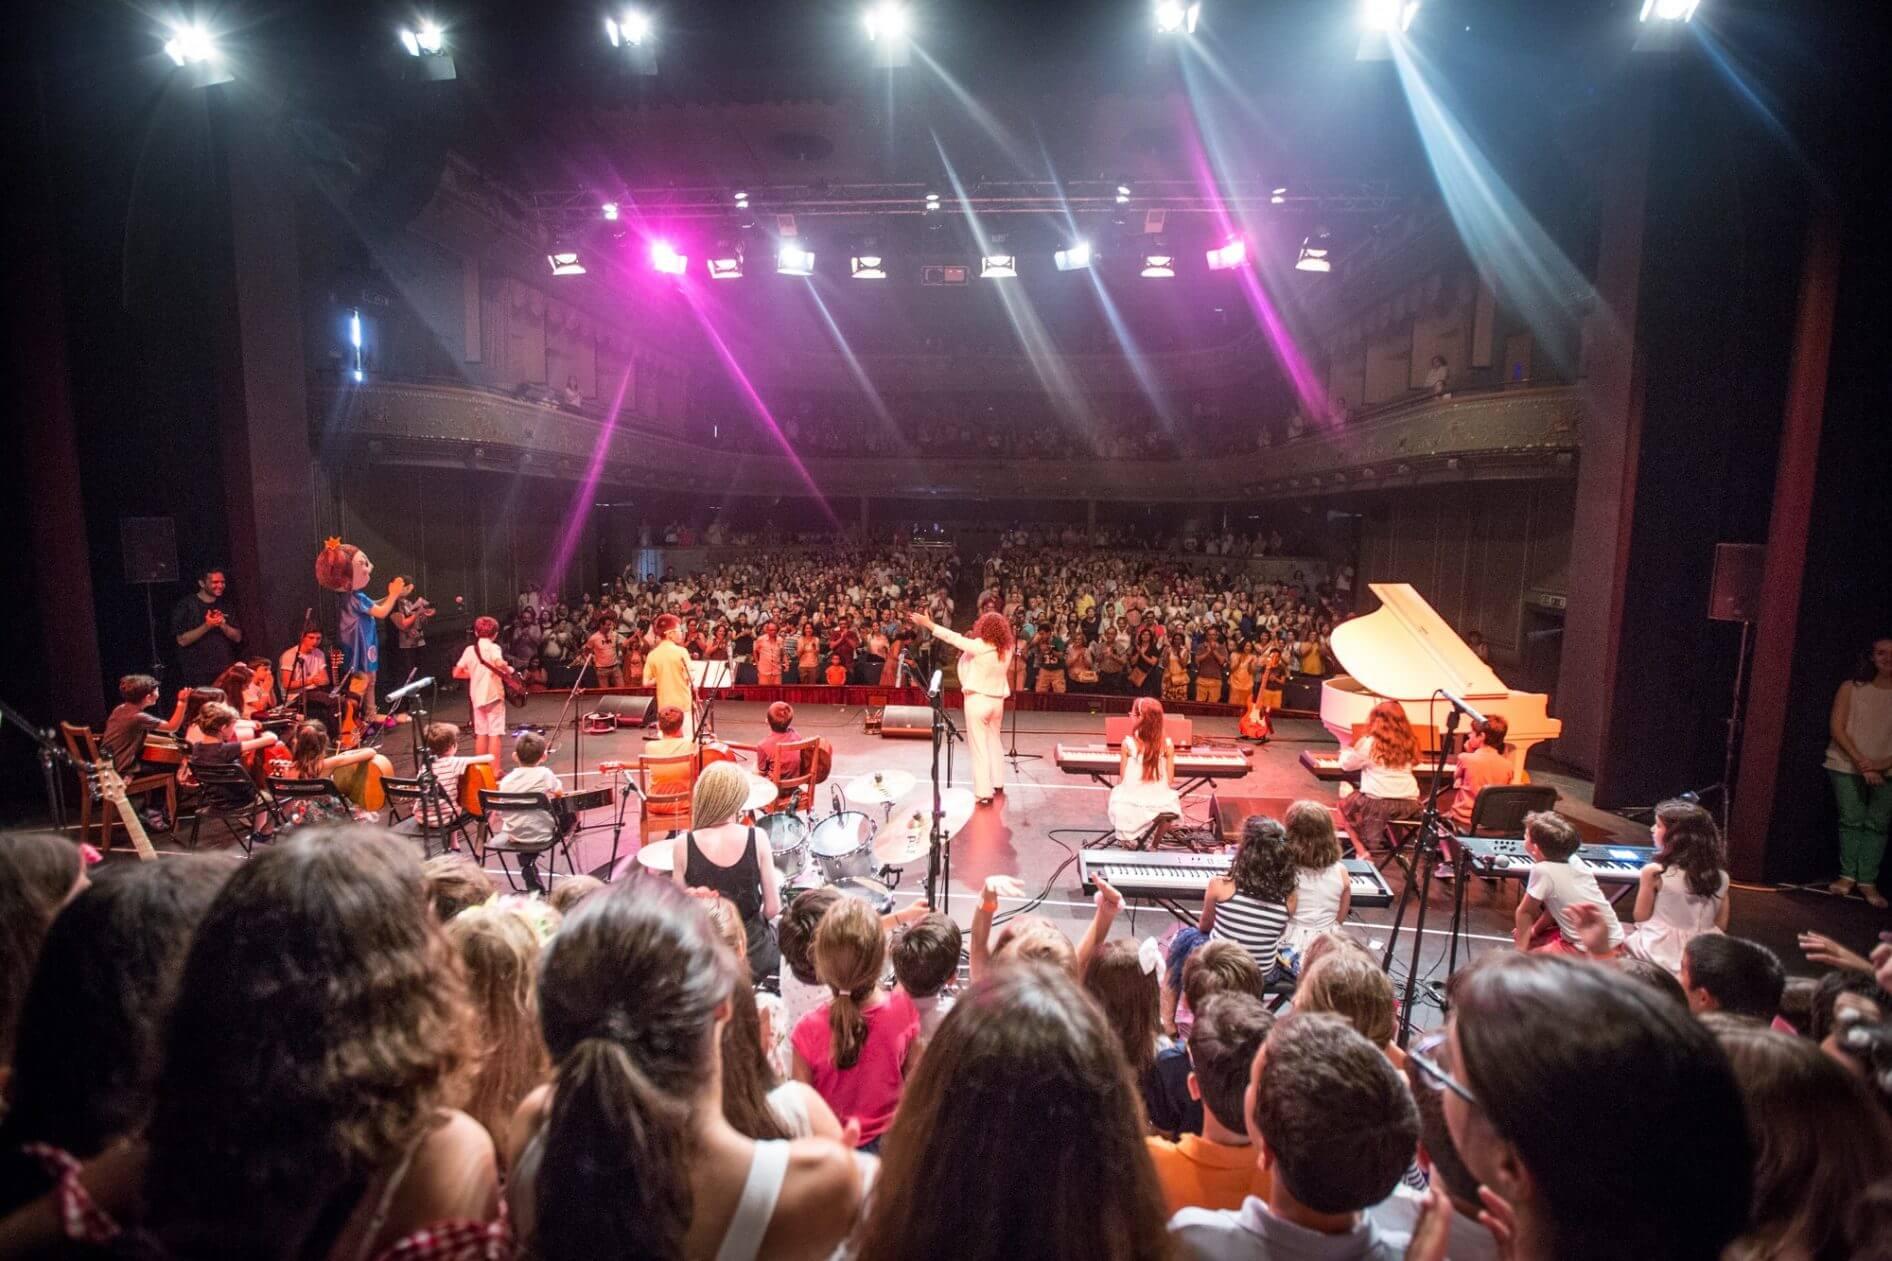 academia de música Academia de Música Academia de Mu  sica e1500393377779 1